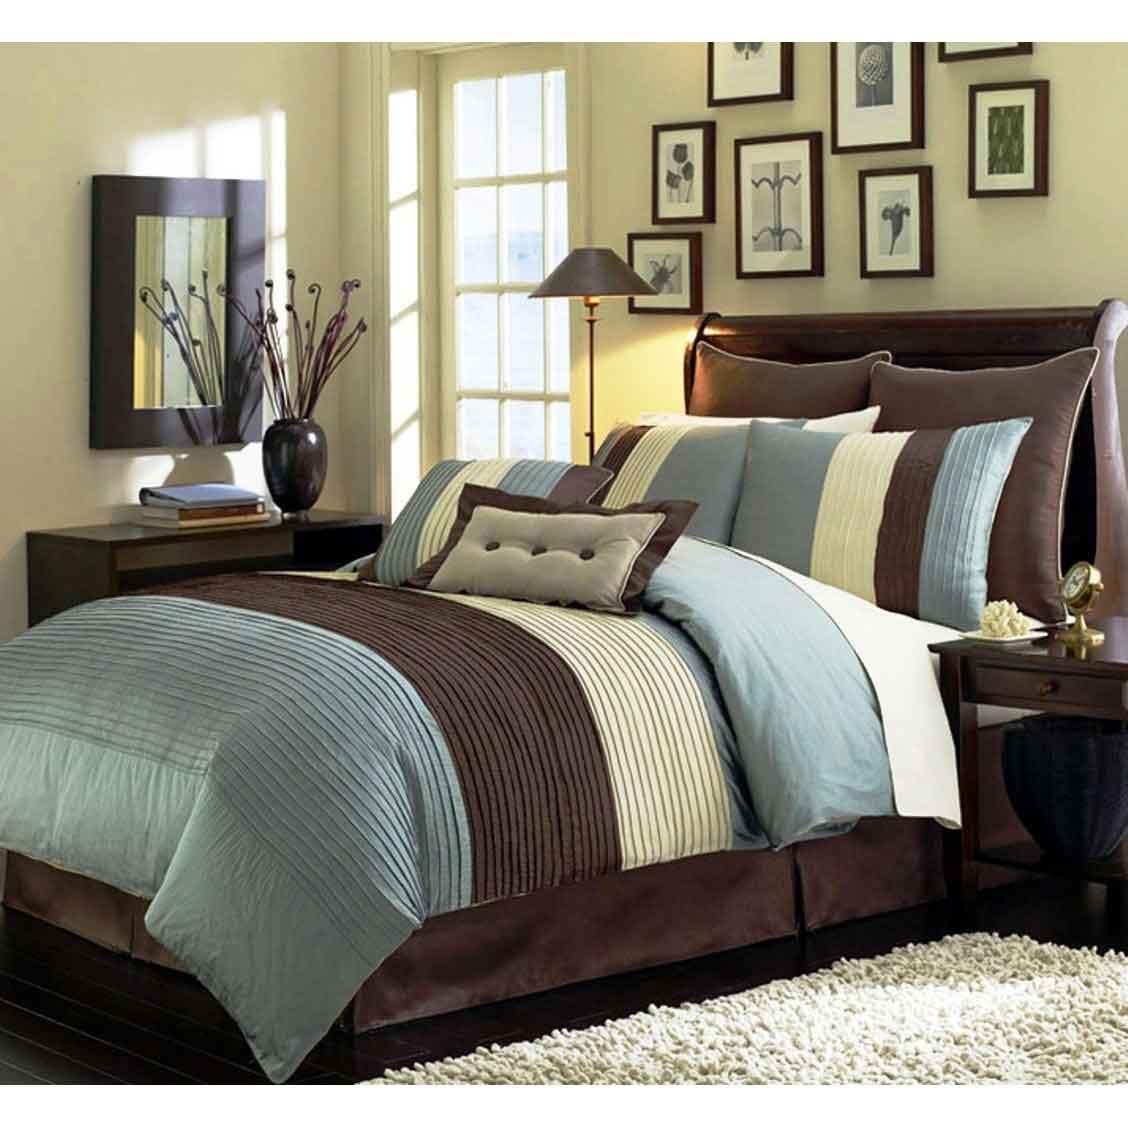 exclusive-decor-brown-blue-bedroom-interior.jpg